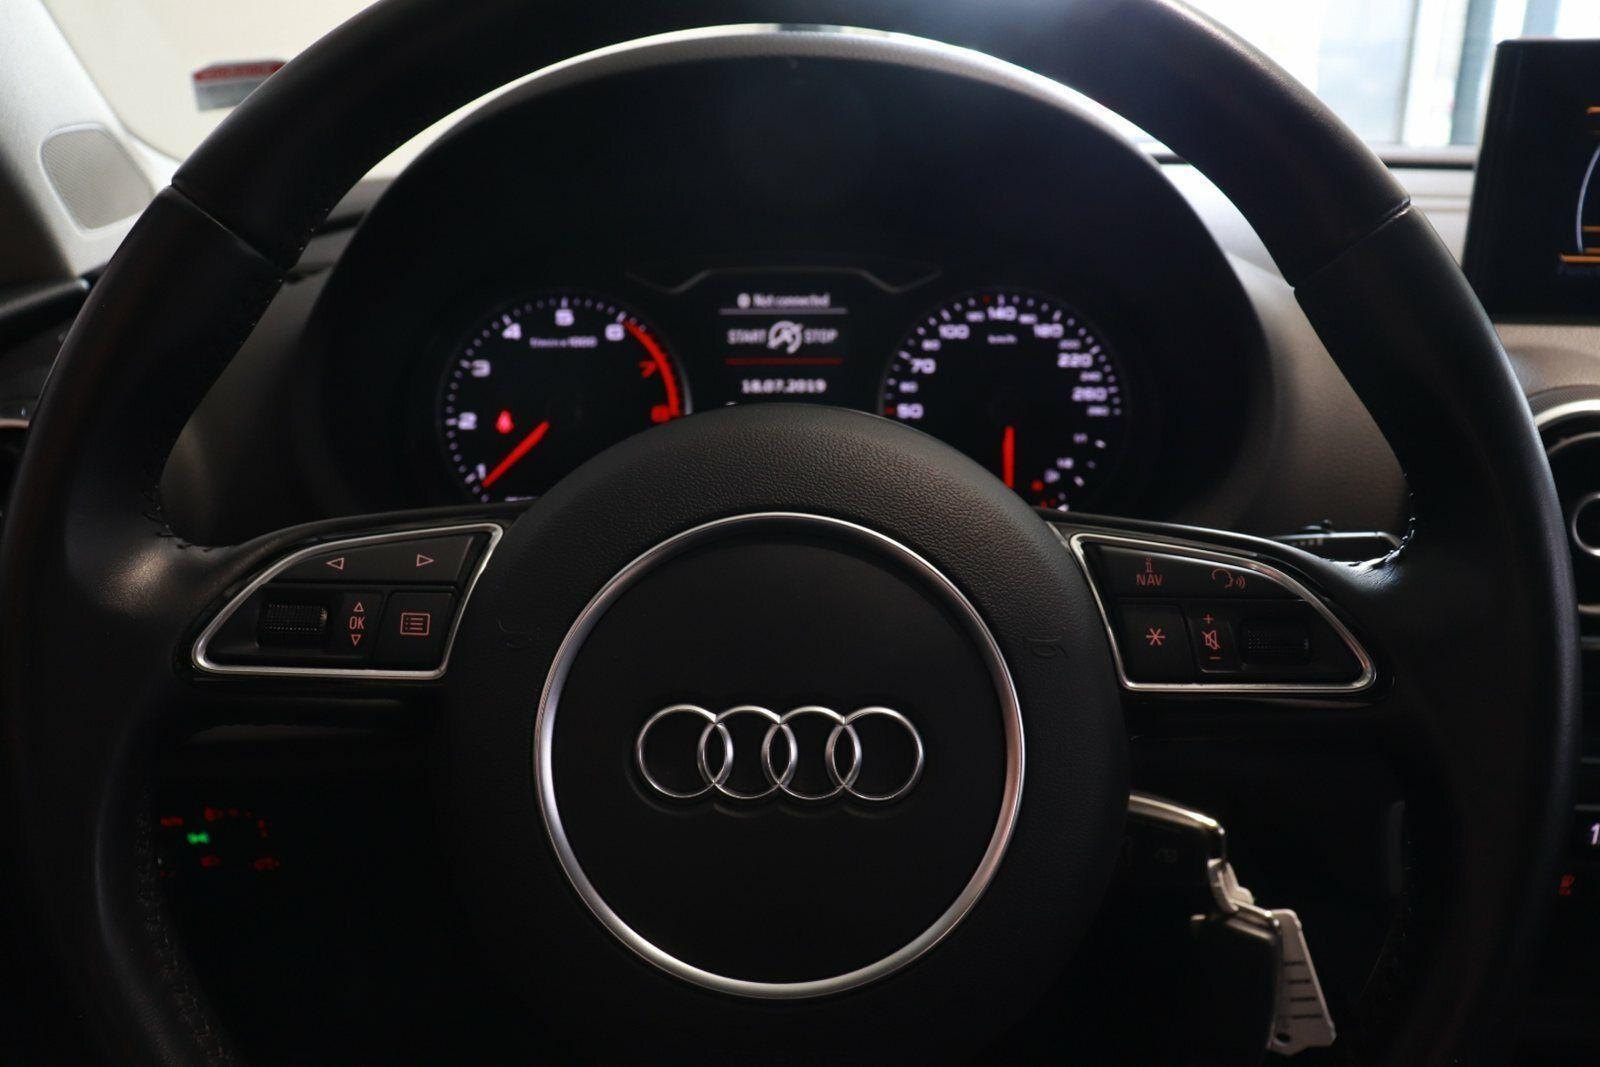 Audi A3 TFSi 150 Ambition S-tr.